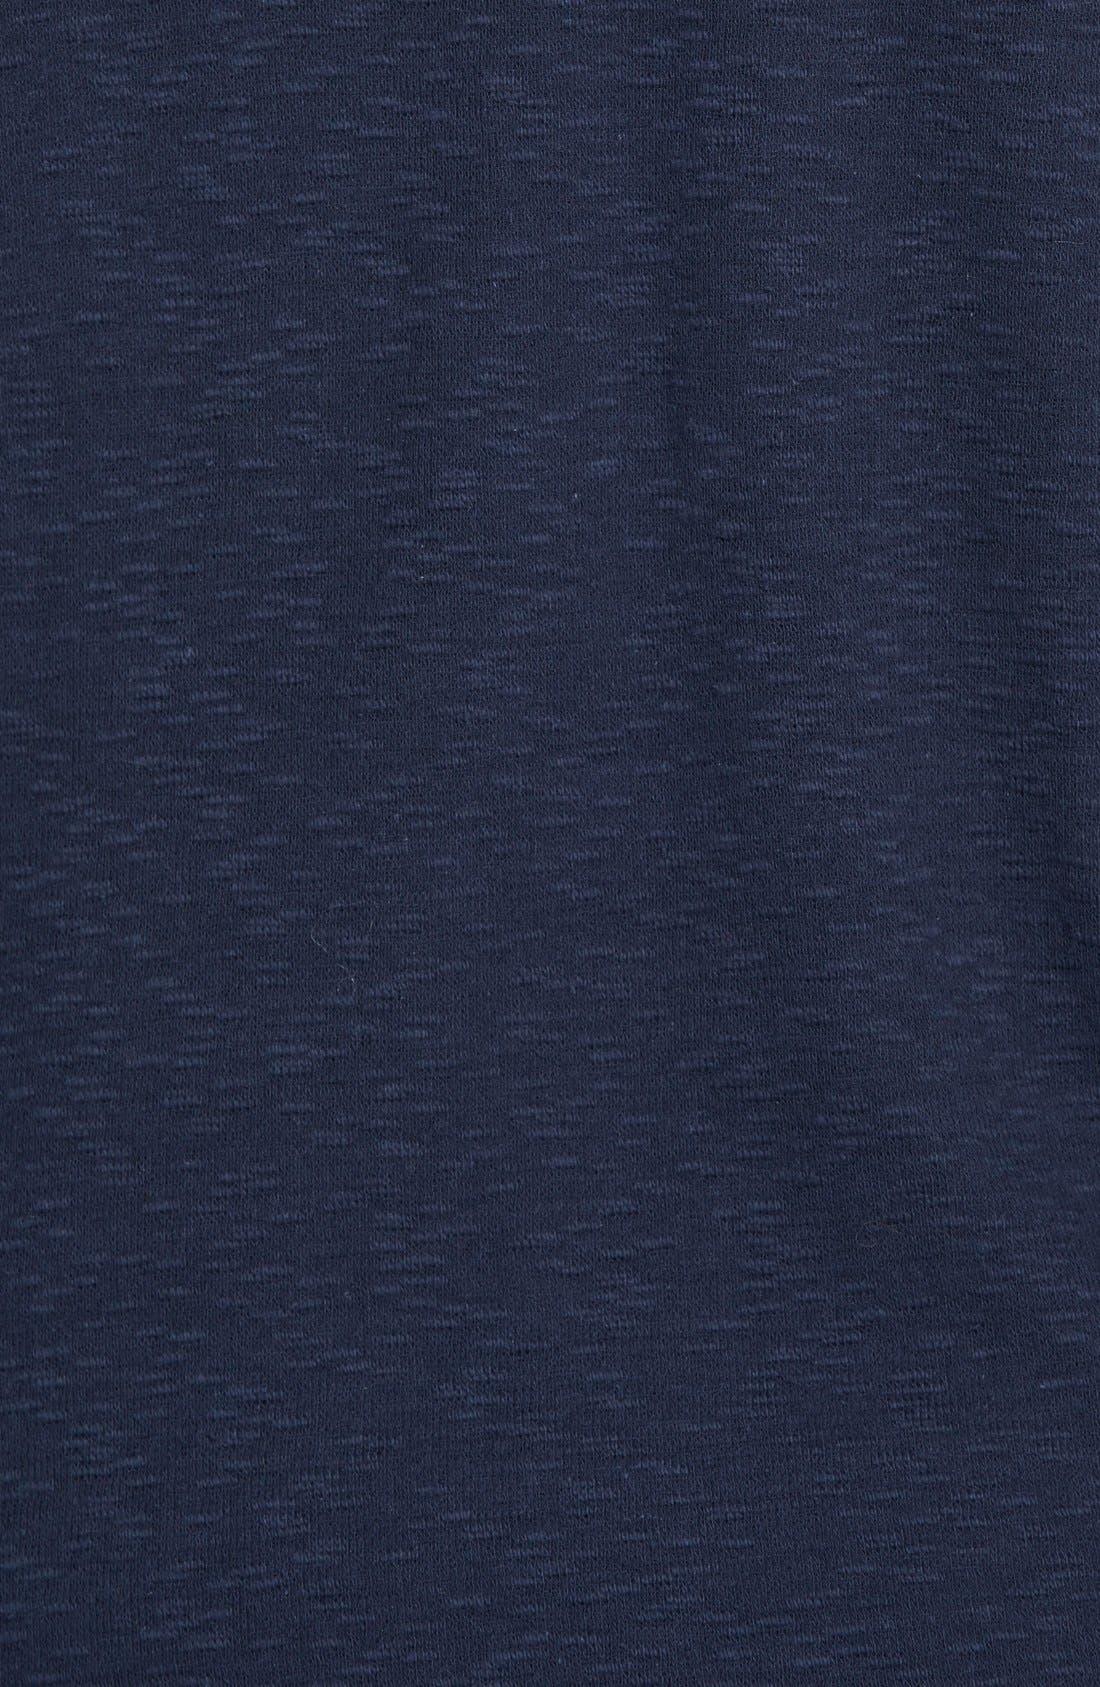 Alternate Image 3  - Jessica Simpson 'Jena' Cotton Top (Plus Size)